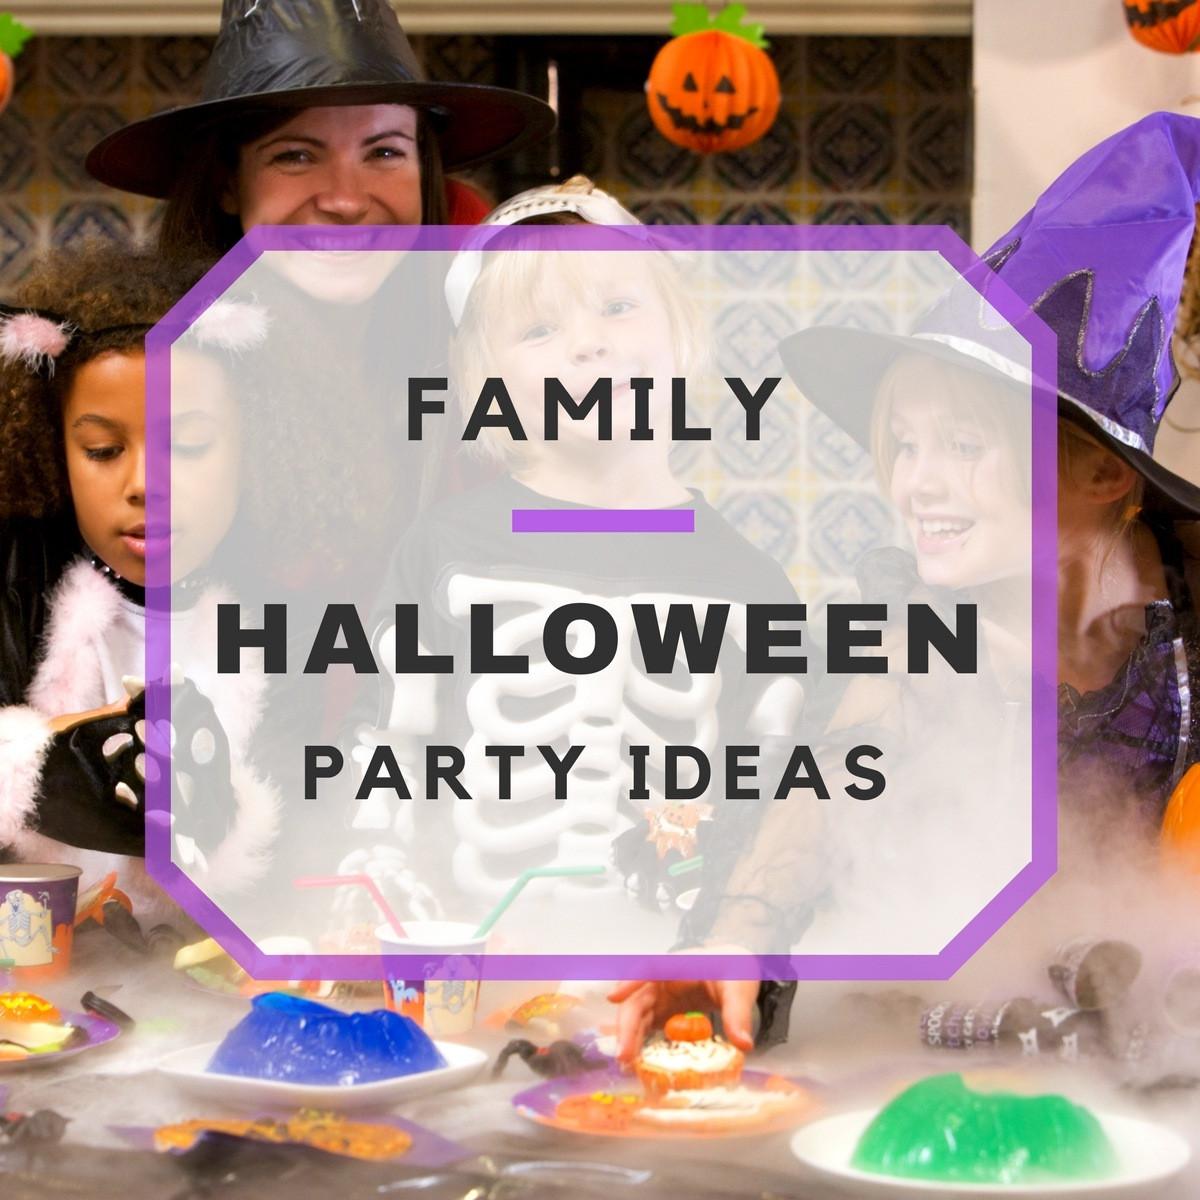 Family Halloween Party Ideas  Spooky Family Halloween Party Ideas